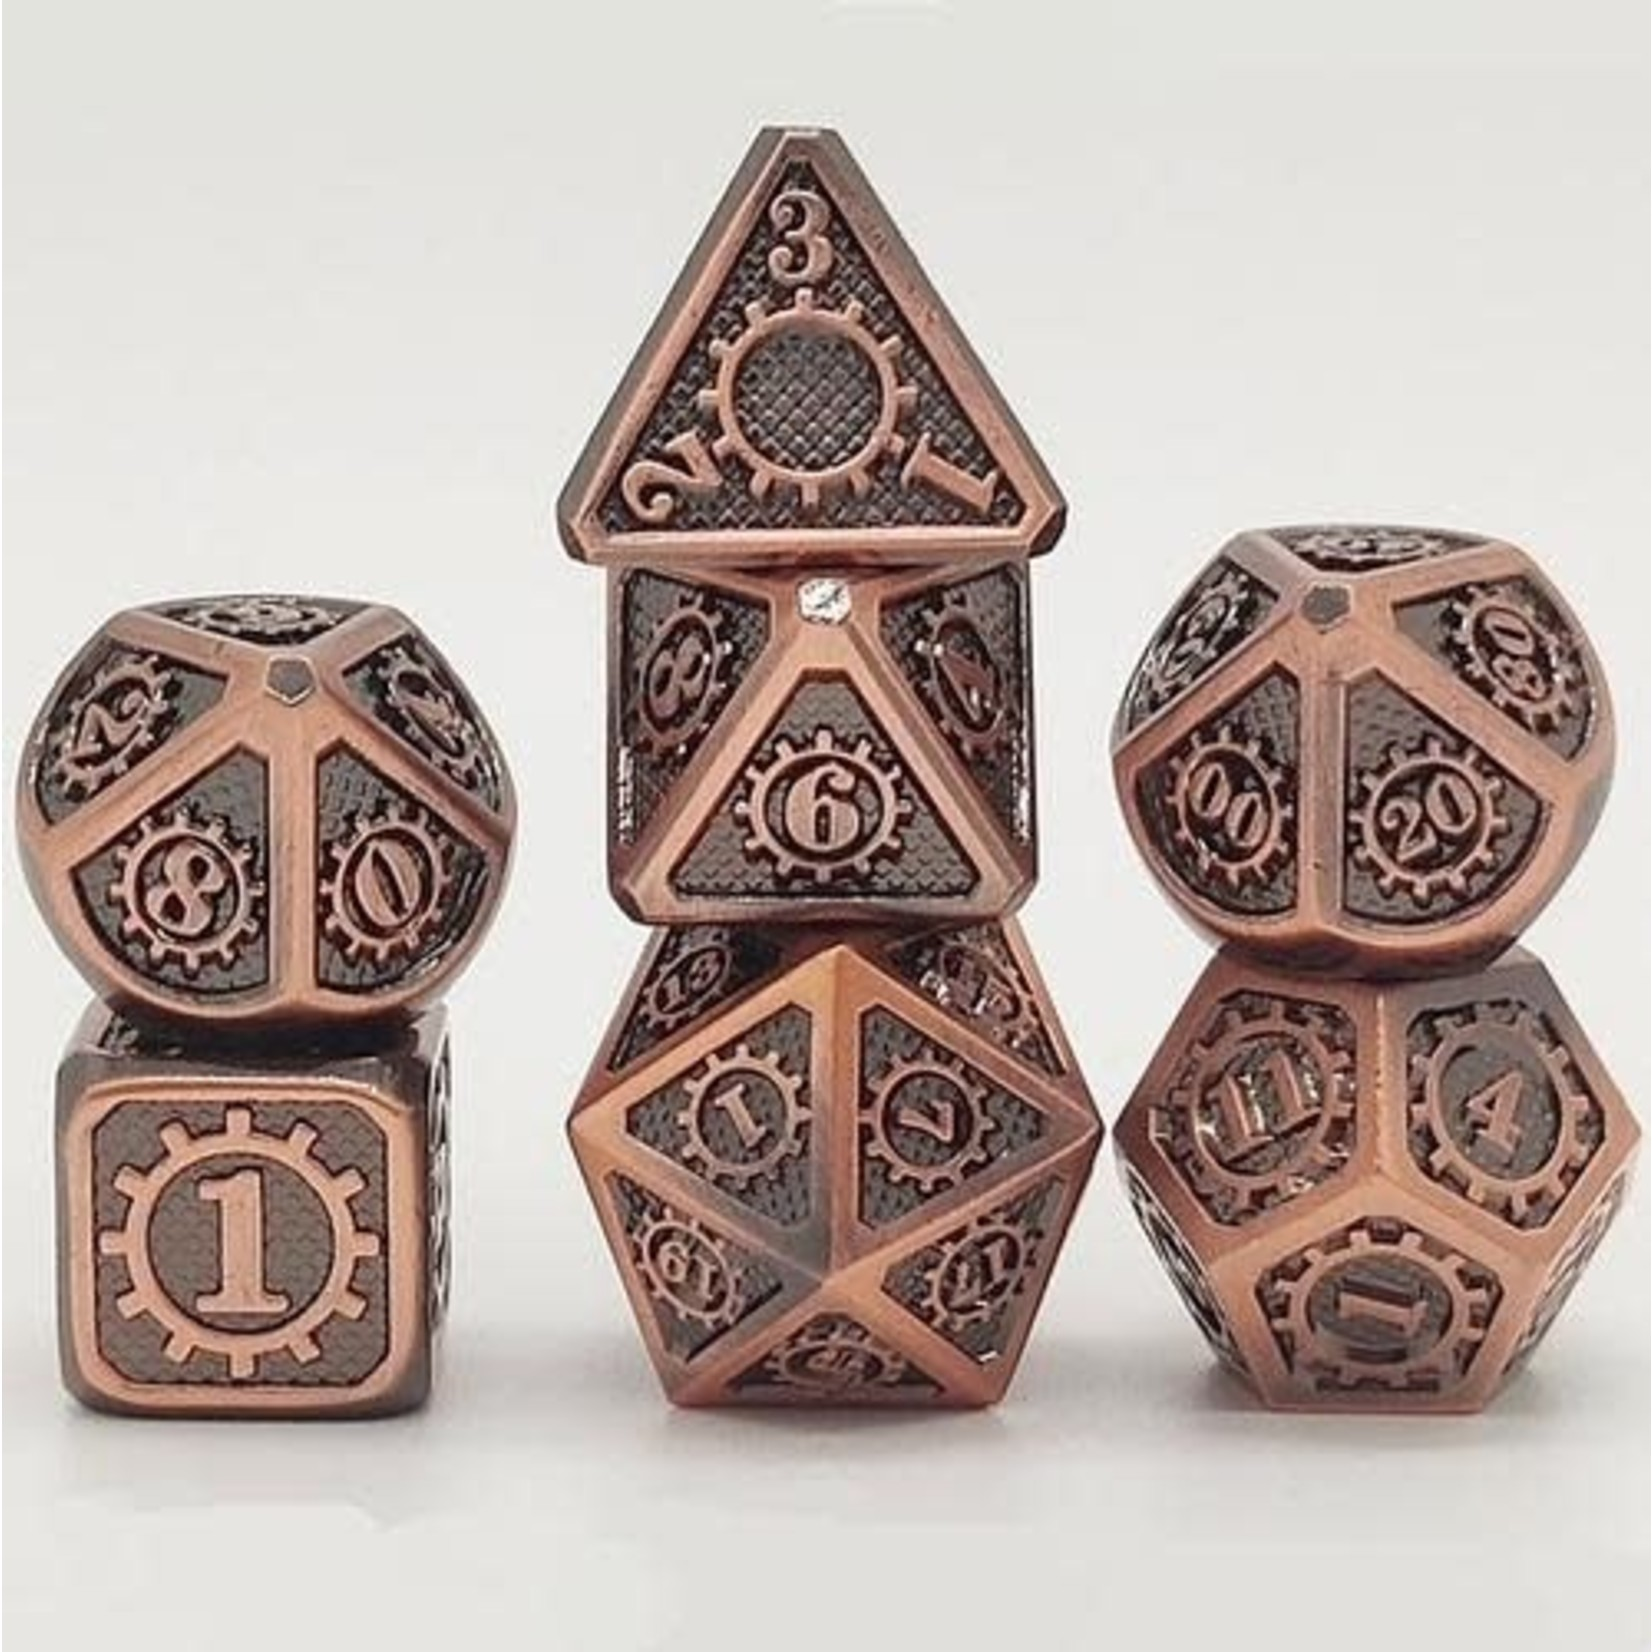 Hymgho Dice US Hymgho 7-Set Gears of Providence Brushed Ancient Bronze Dice Set